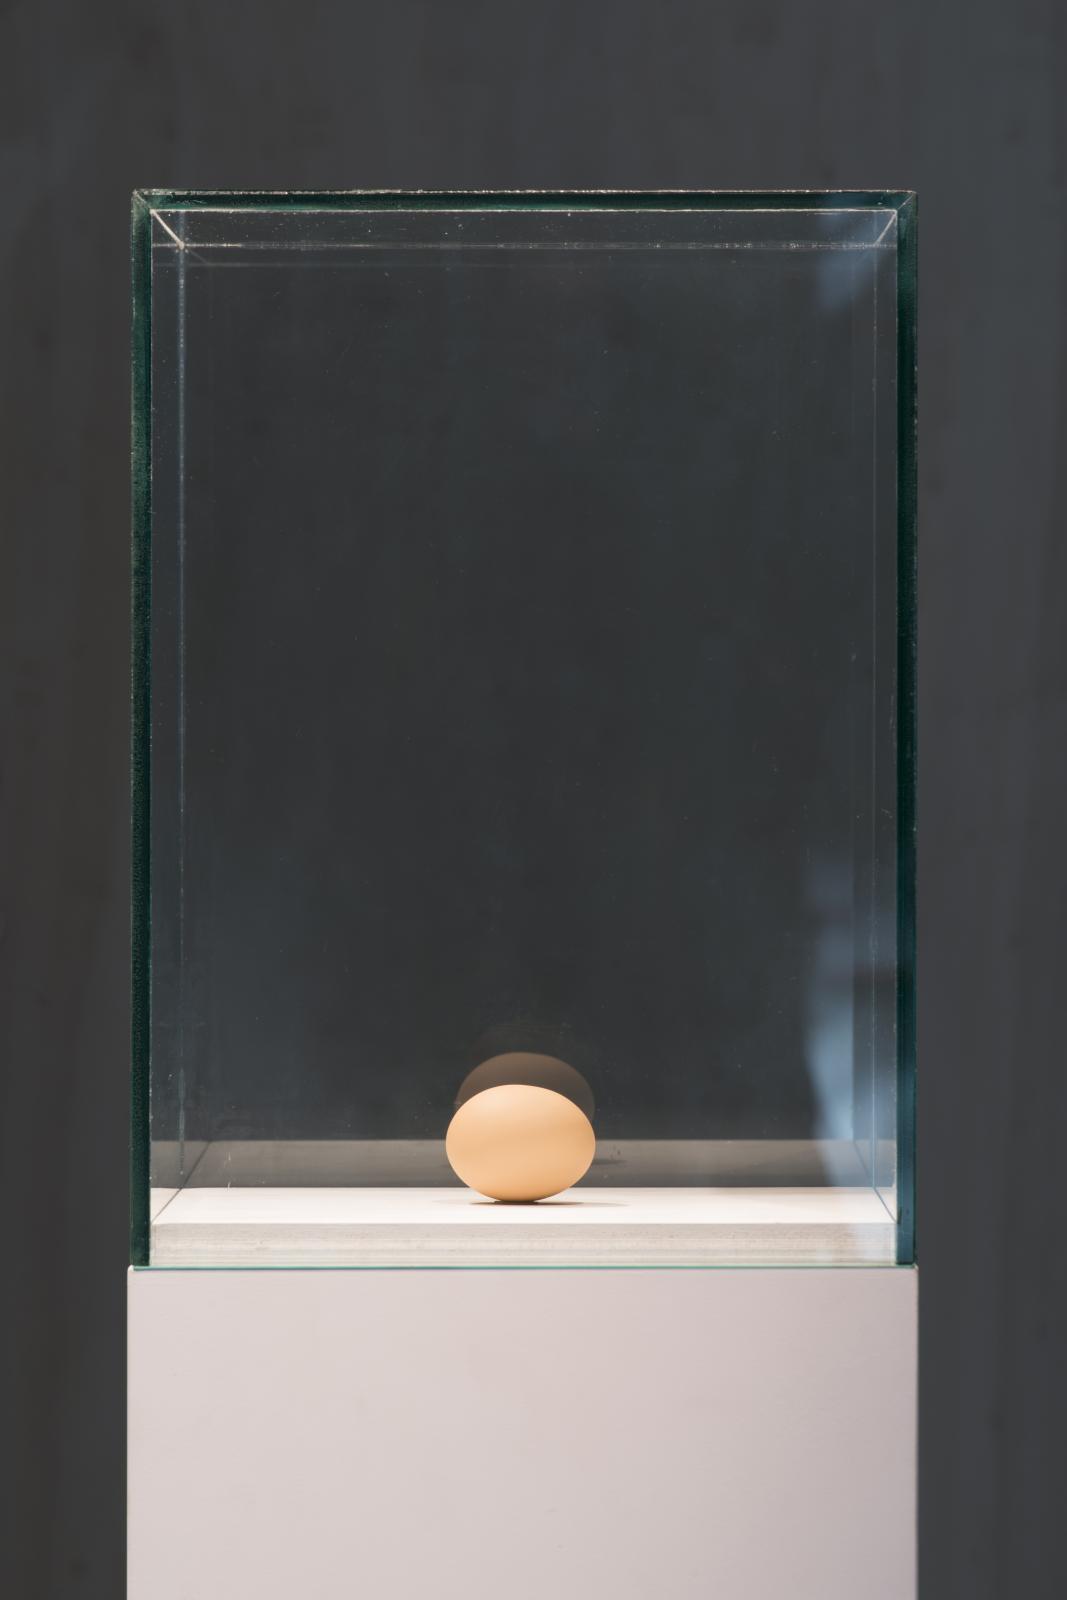 Ugo Rondinone (né en 1964), Still Life (One Egg), 2012, bronze, plomb, peinture, 4,8x4,8x6,3cm.